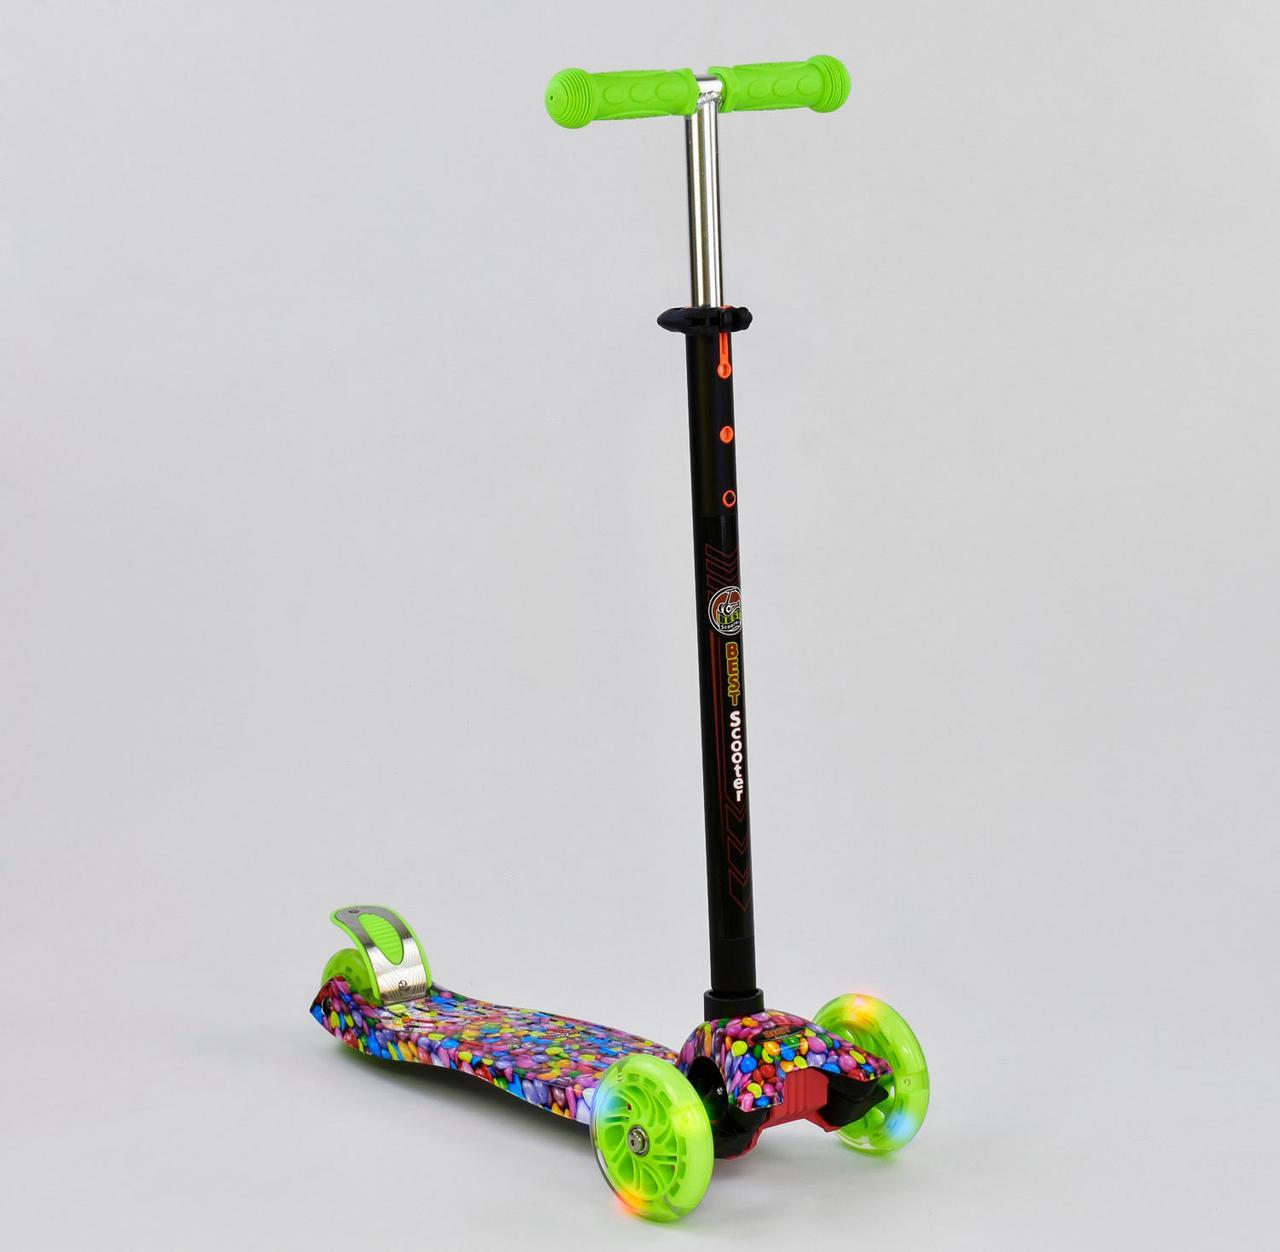 Детский самокат MAXI Best Scooter. Карамелька . Светящиеся колеса!